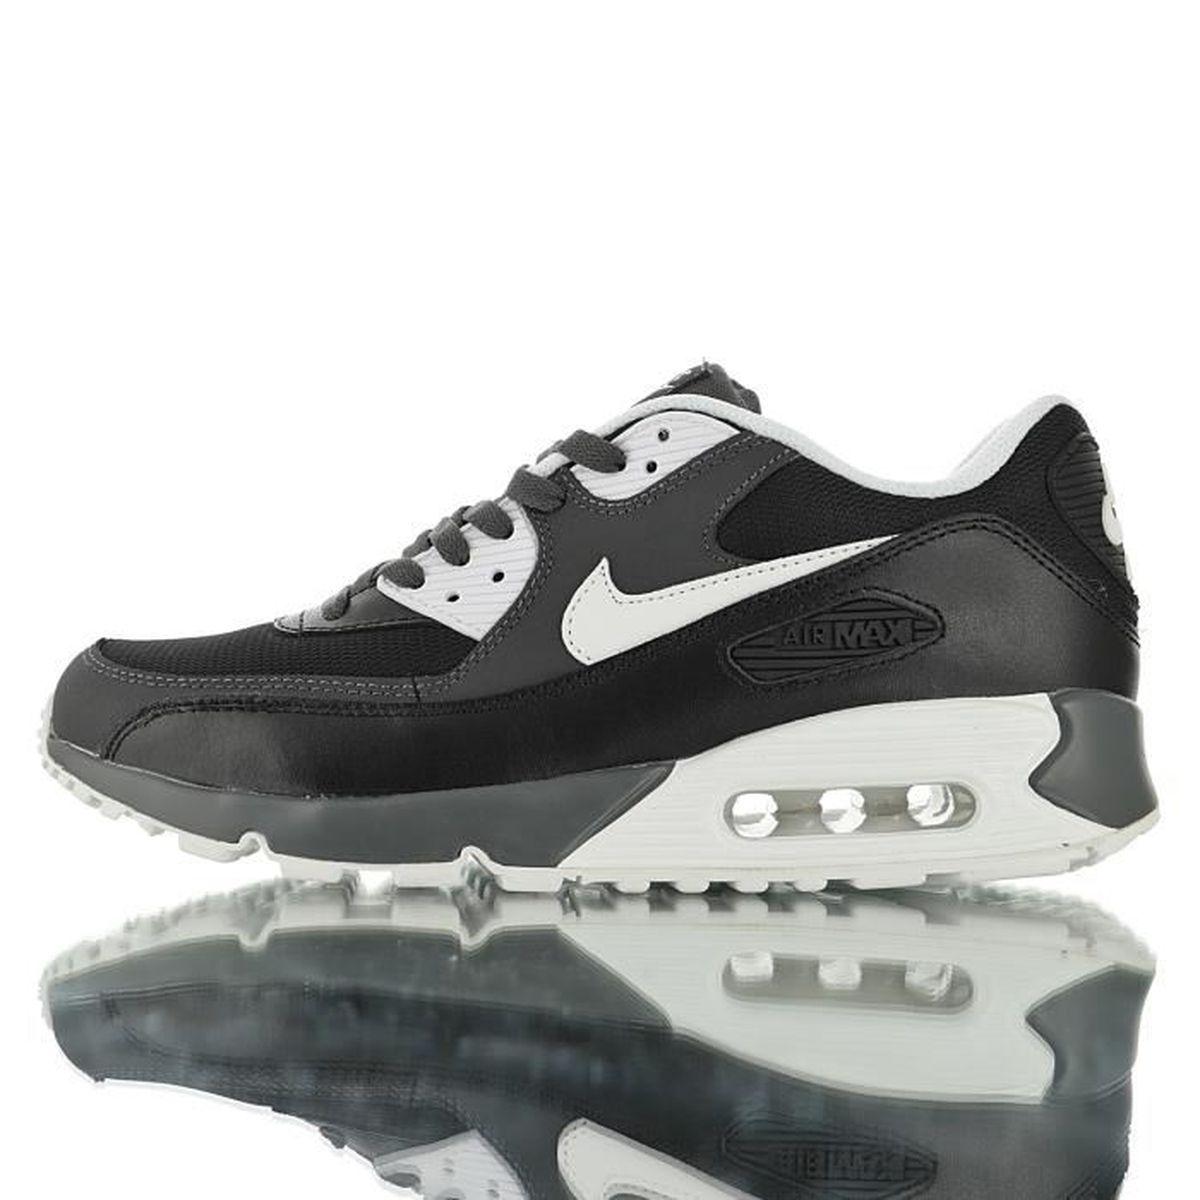 Baskets Nike Air Max 90 Homme Noir Noir Noir - Cdiscount Chaussures